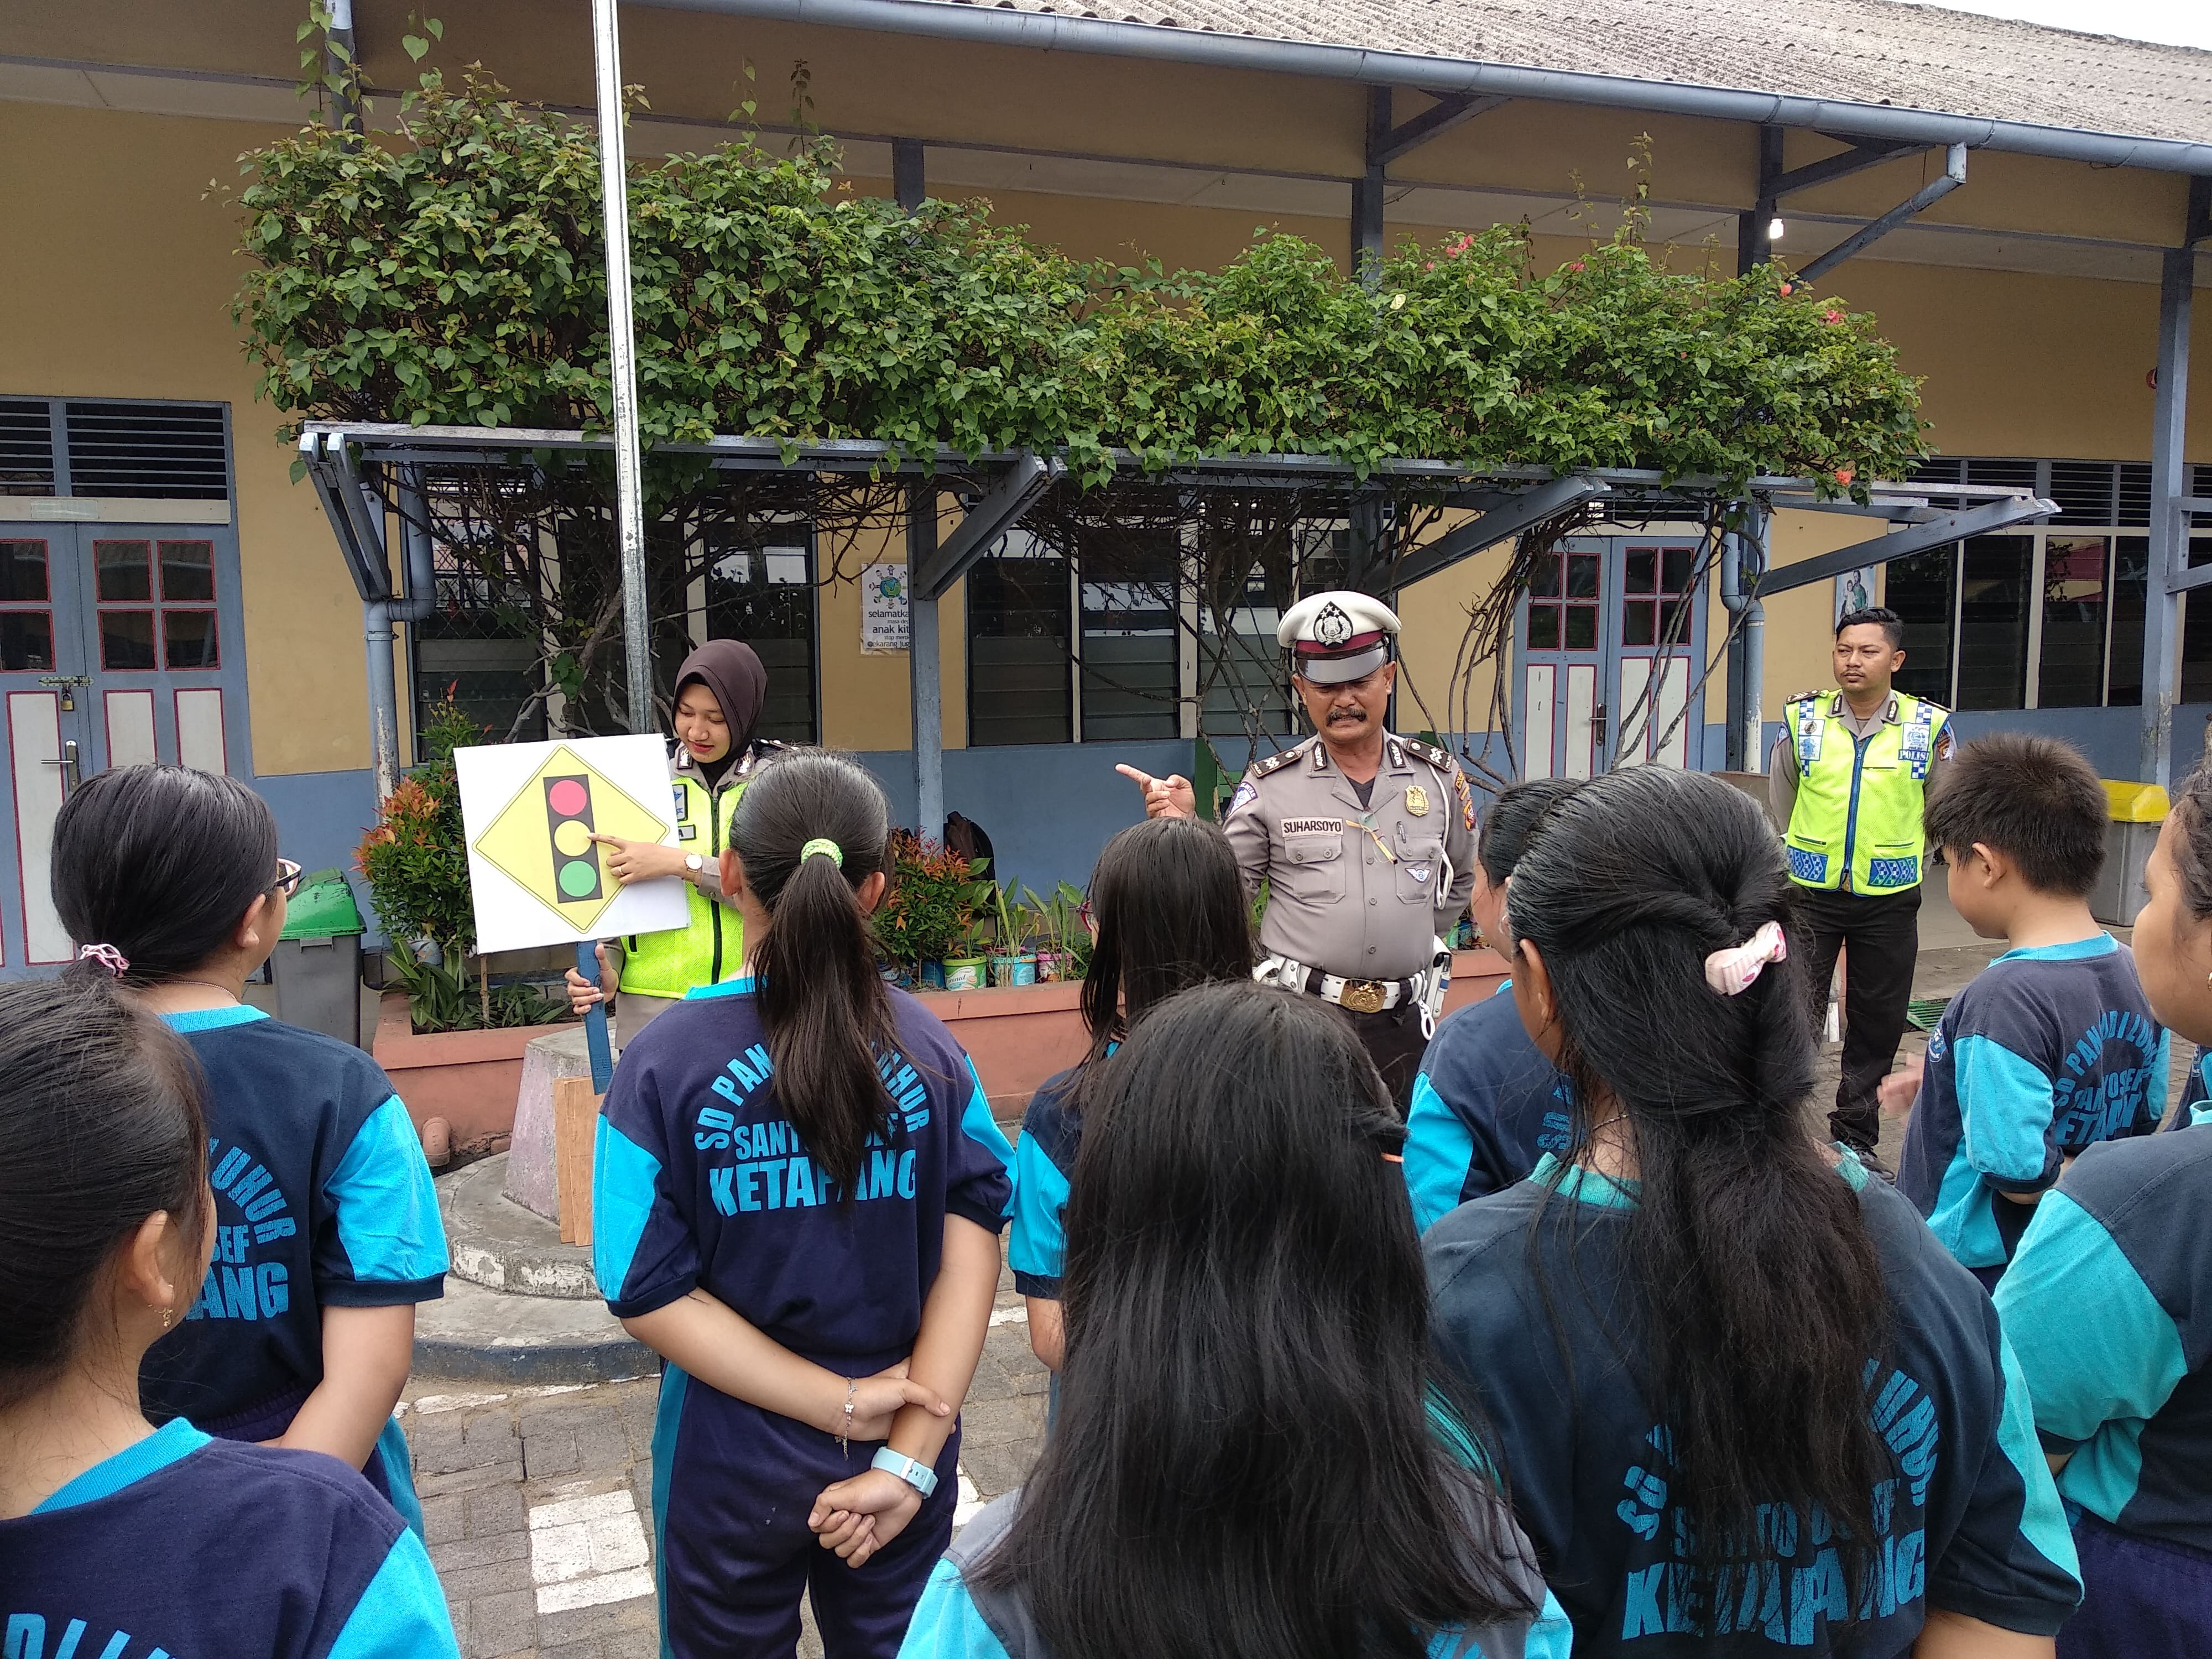 Satgas preemtif Ops zebra Kapuas 2018 Polres Ketapang mengedukasi anak-anak tertib berlalulint